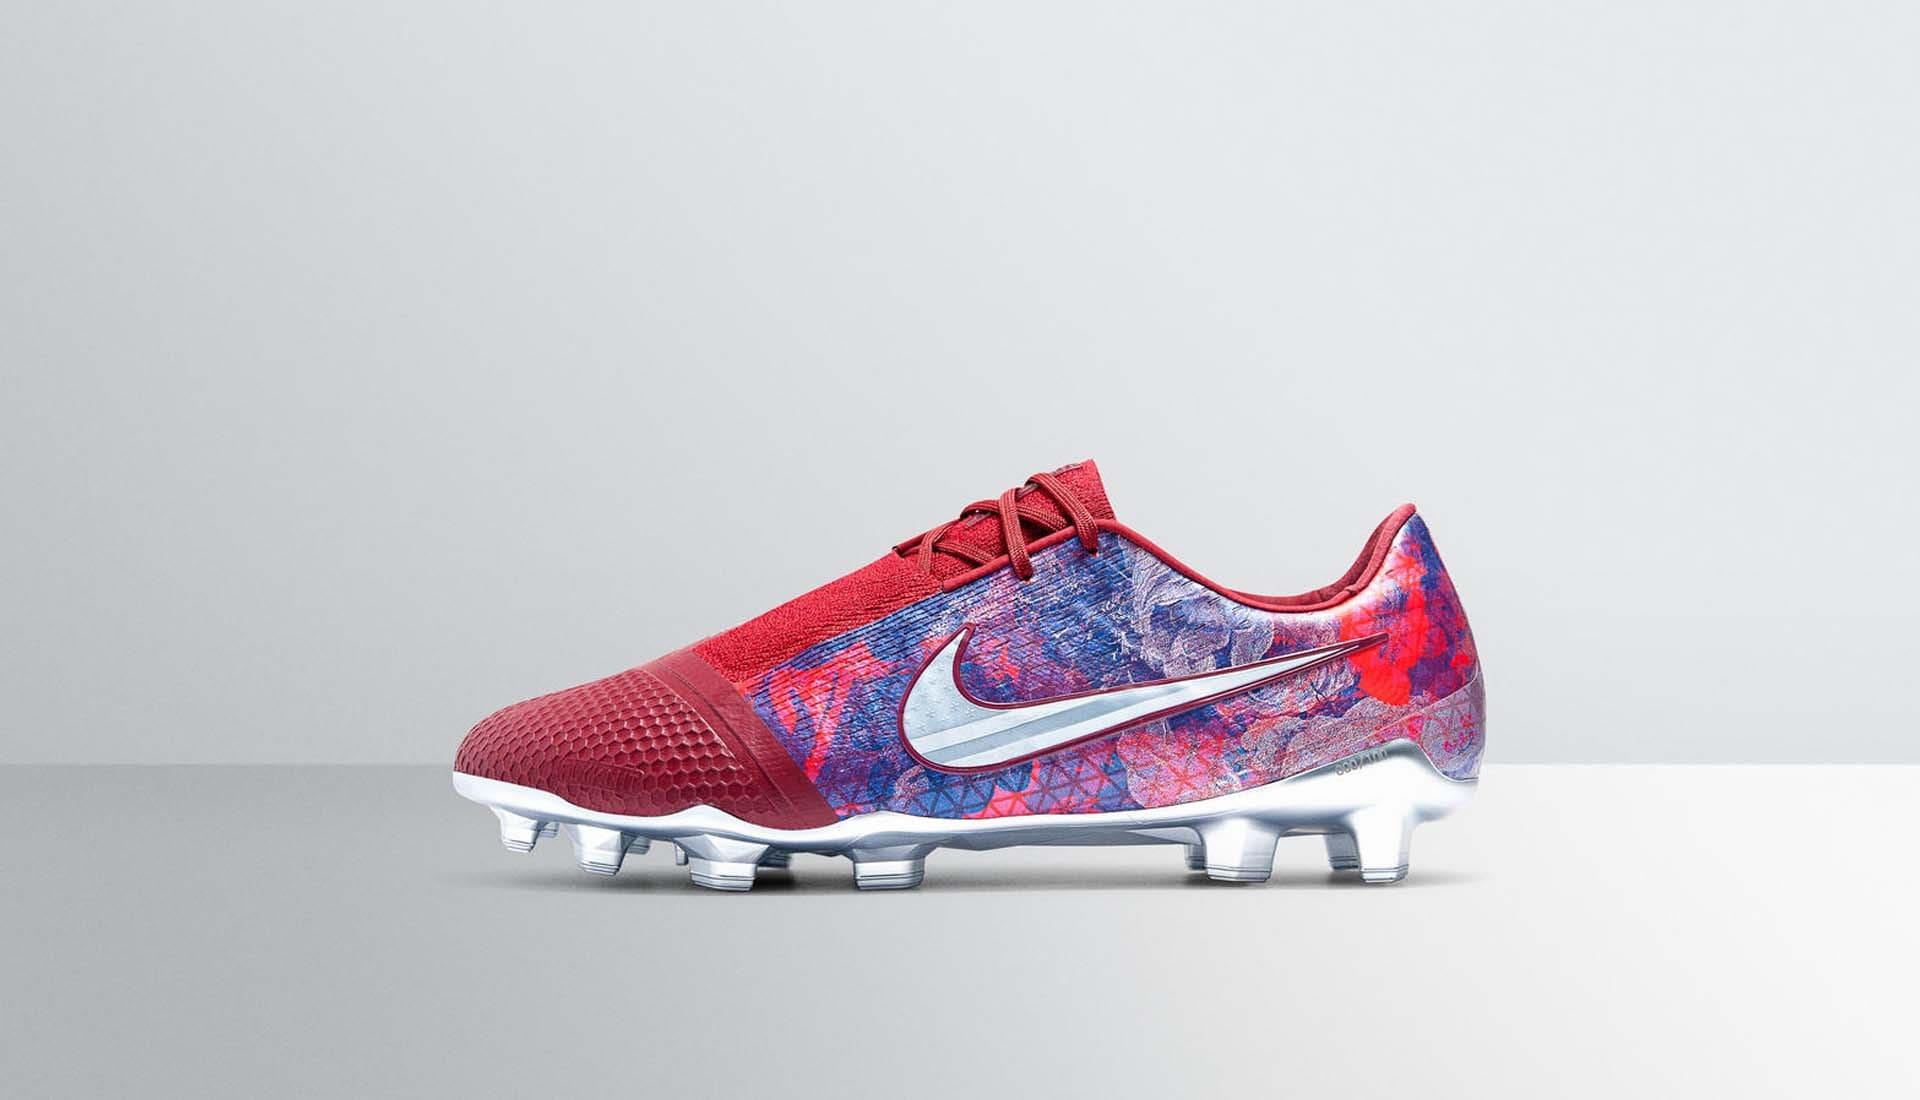 80ddb369e7c Nike Present Alex Morgan With Special-Edition PhantomVNM - SoccerBible.